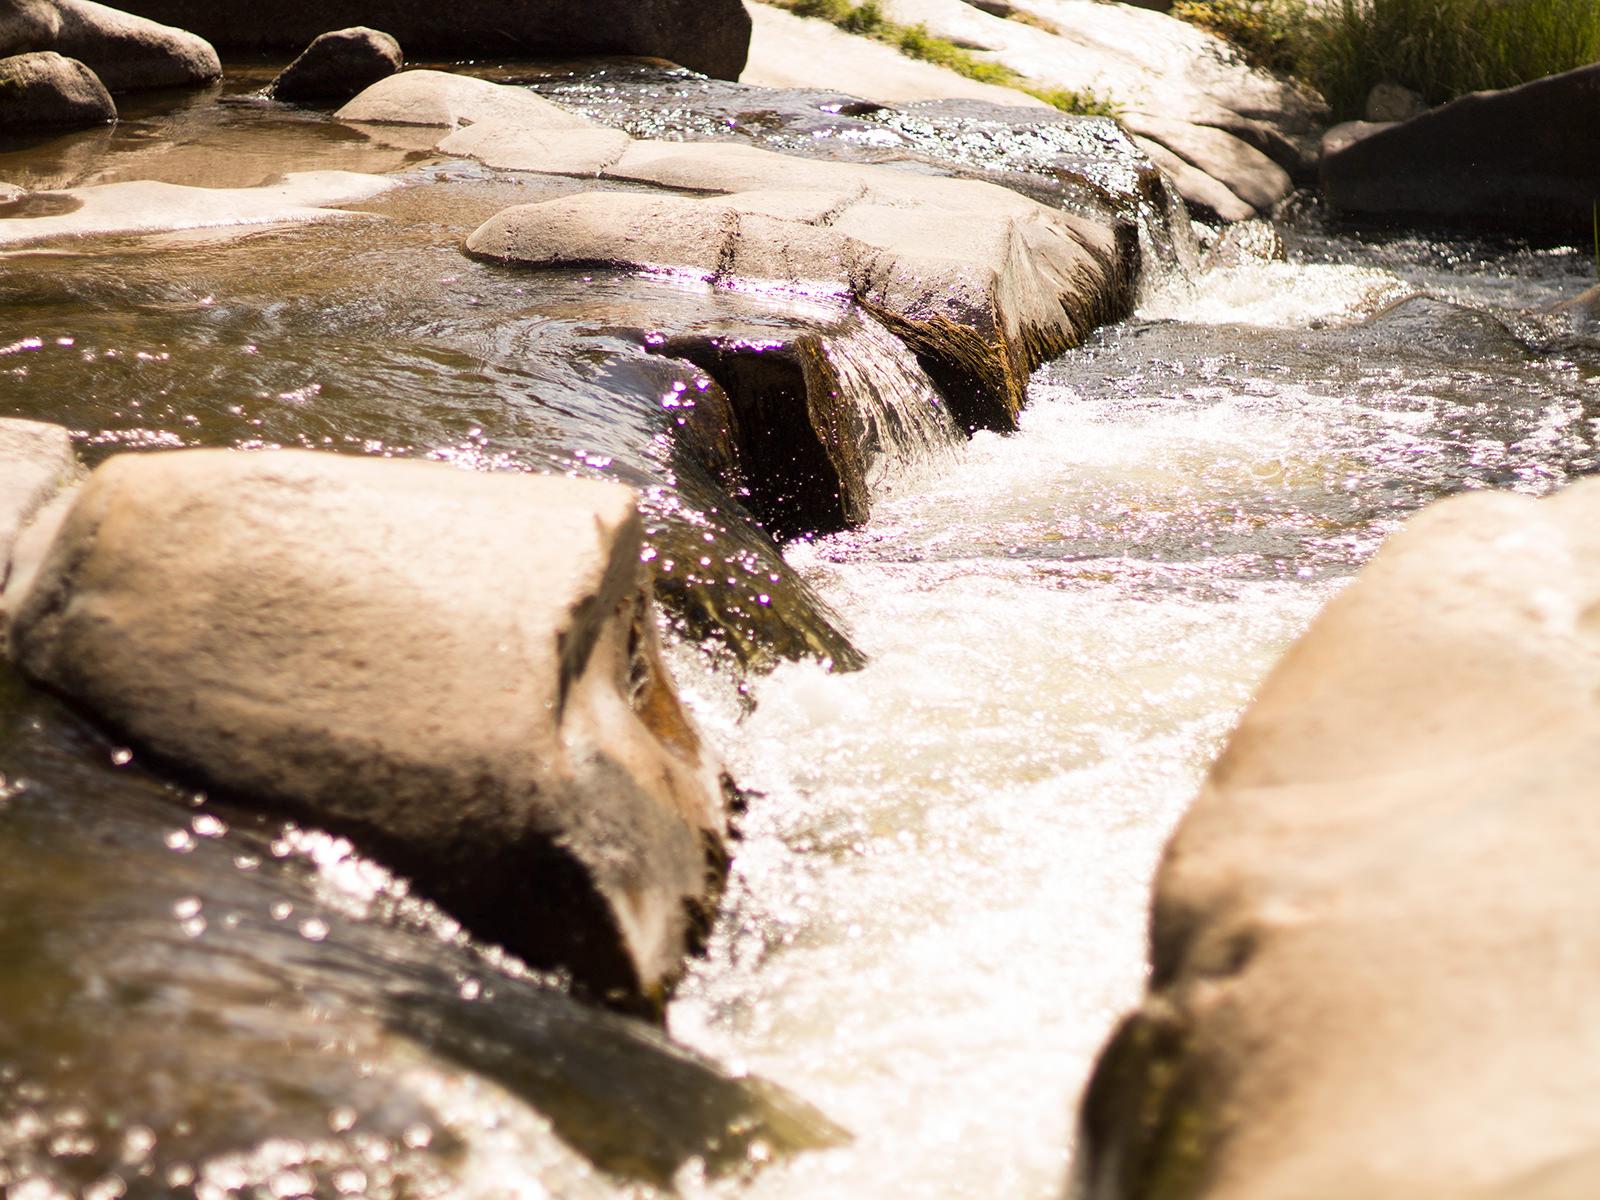 Picnic Time. Un picnic a la orilla del río #soyinspiracción